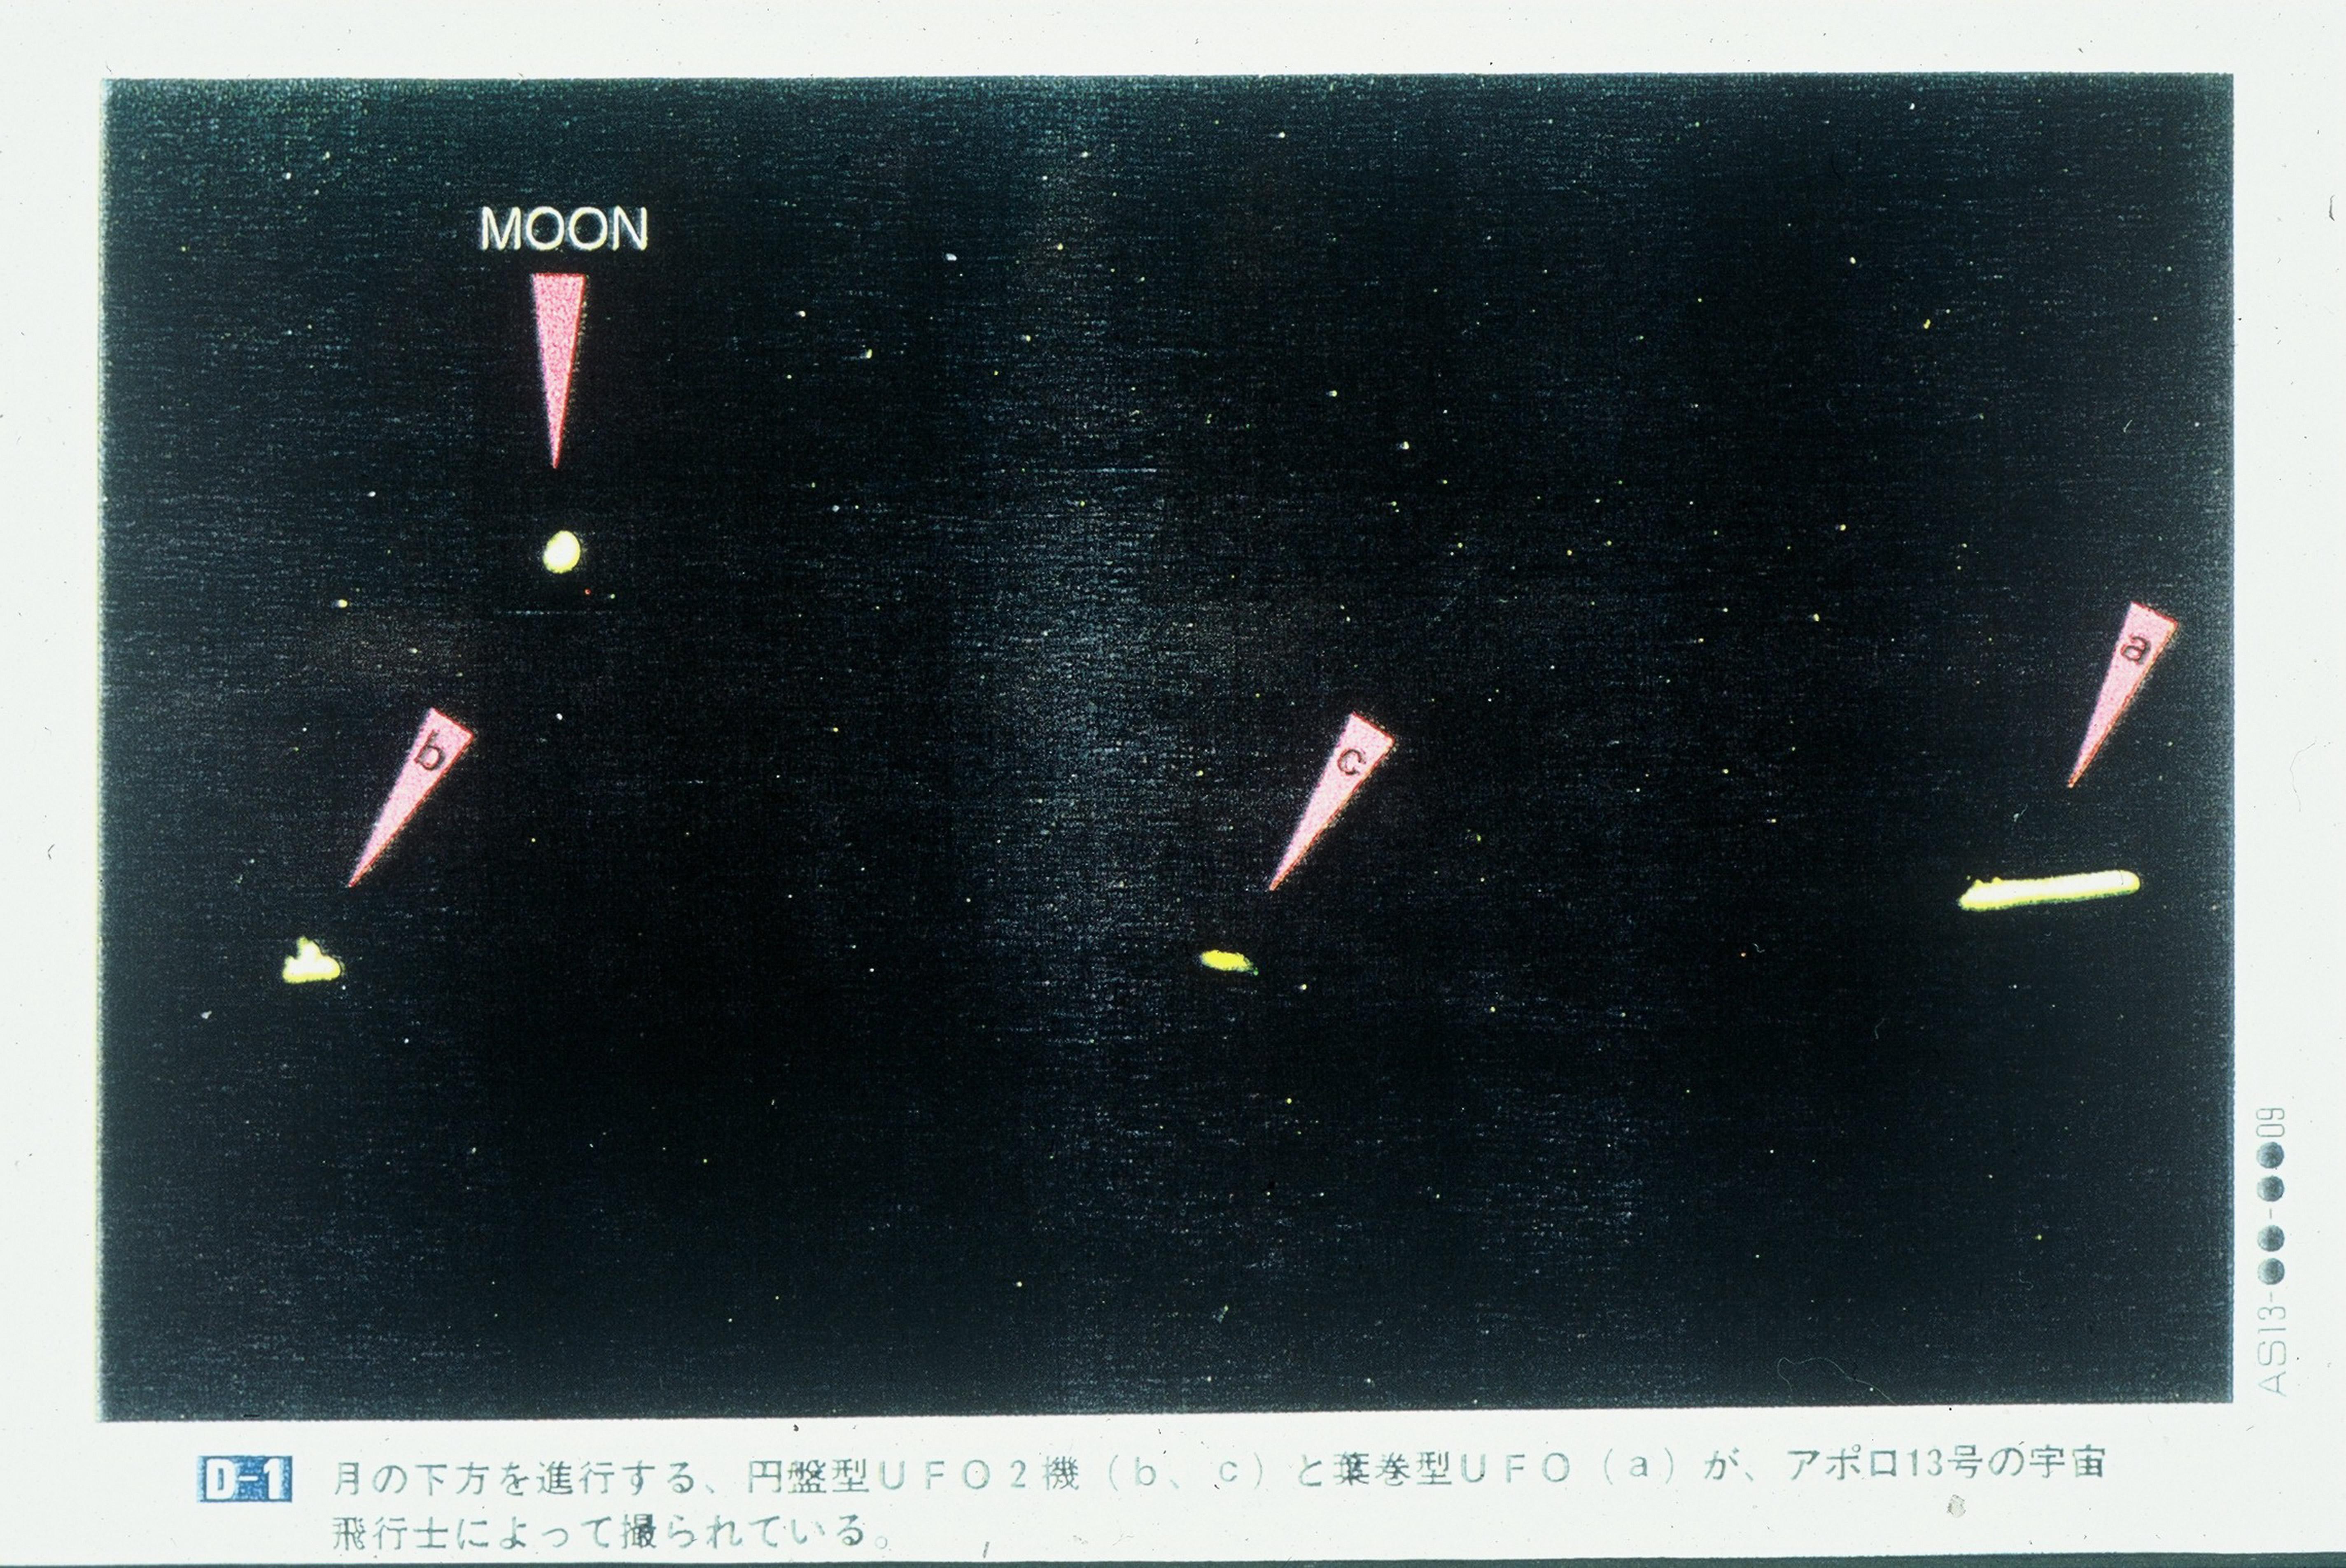 Secret Space Program and the Missing Quadrillions